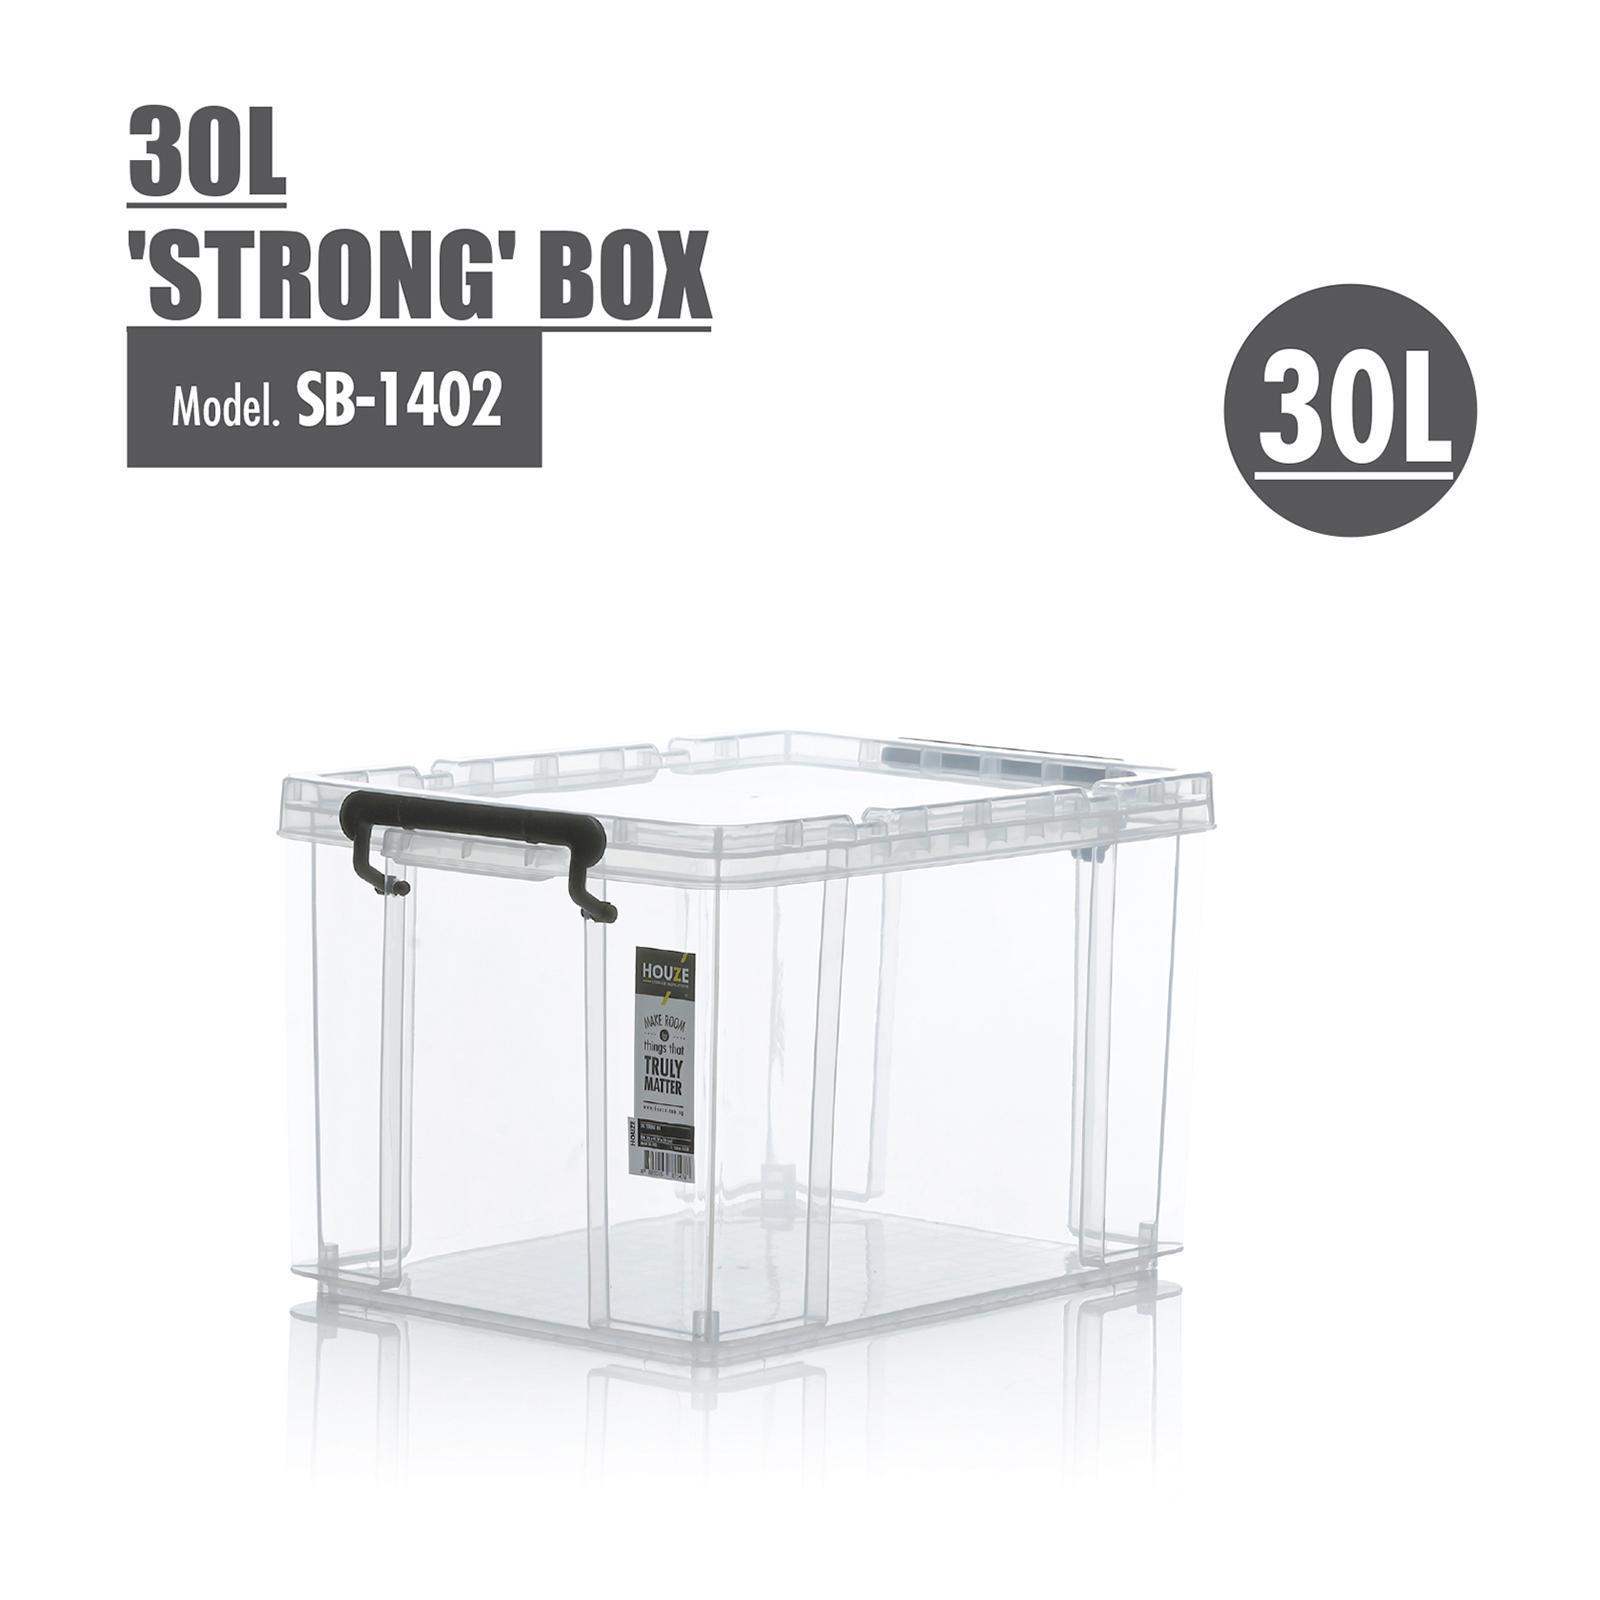 HOUZE 30L 'Strong' Box